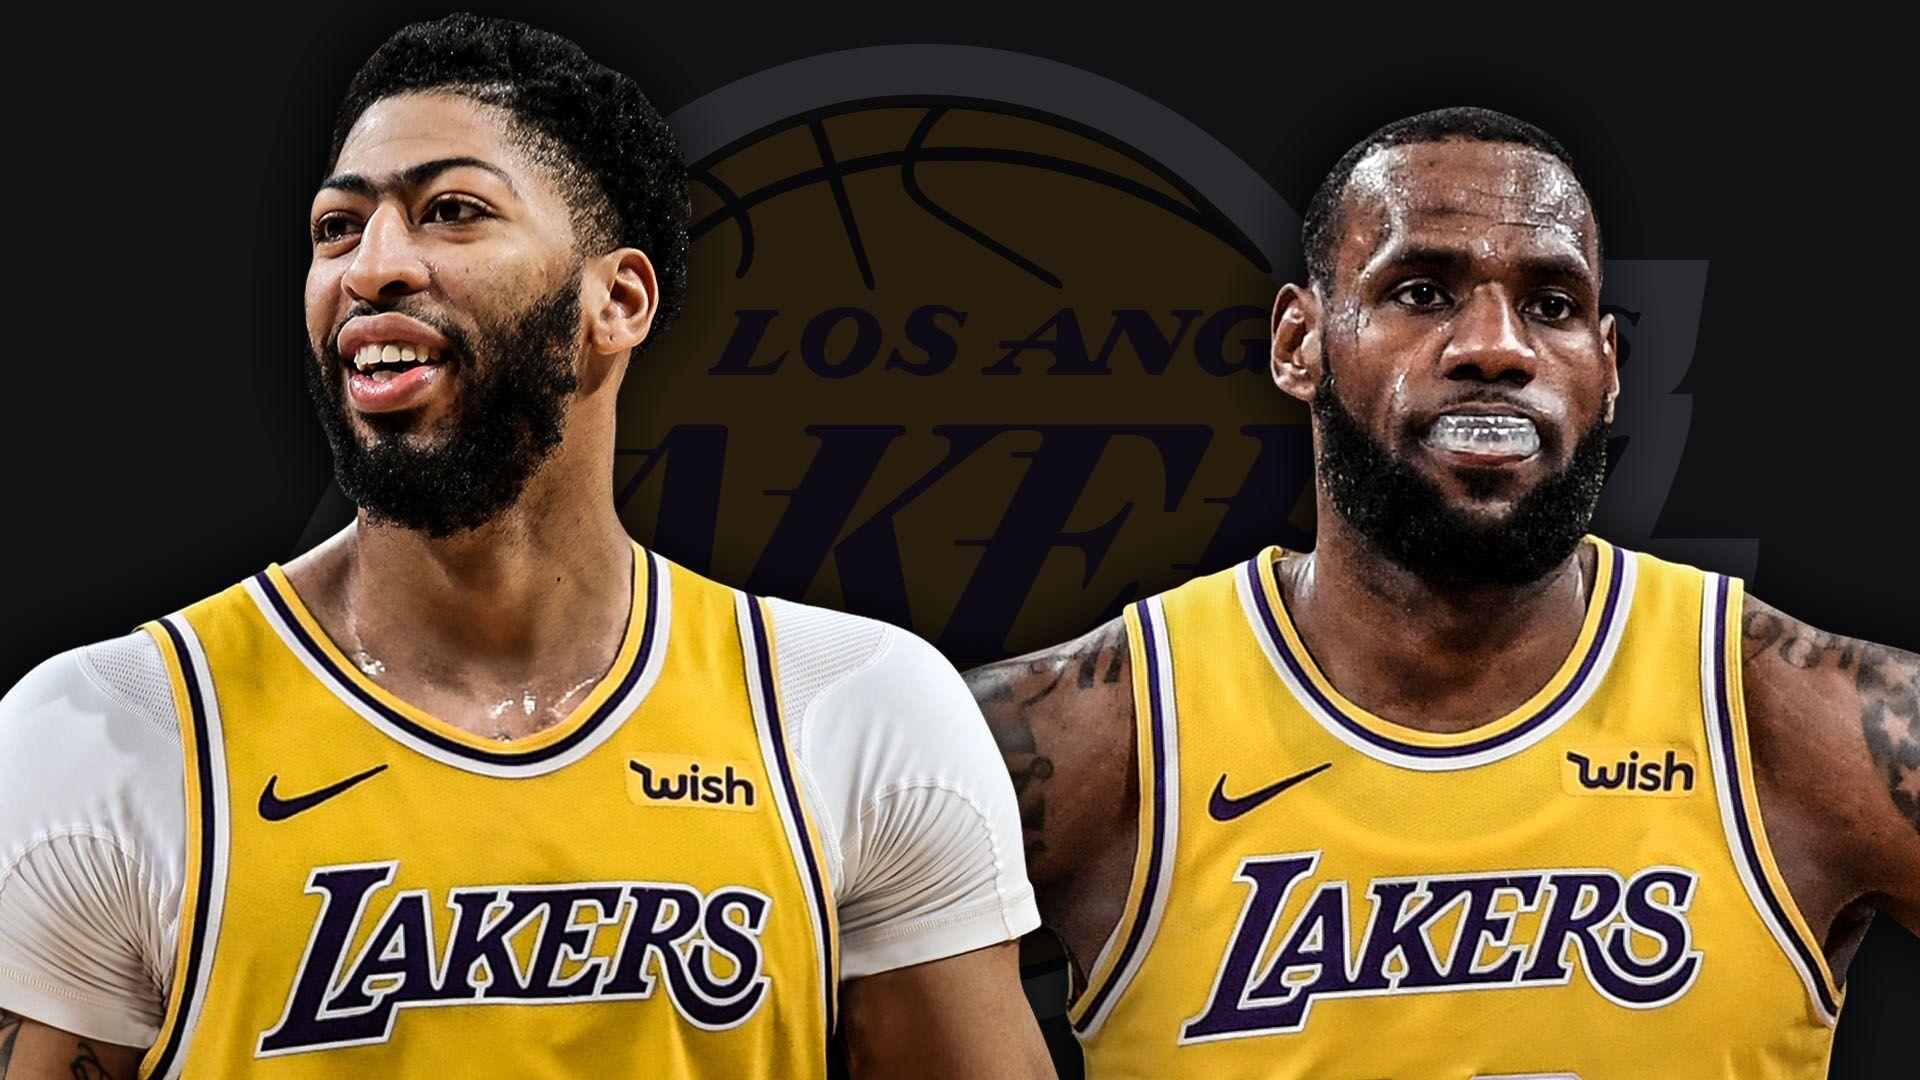 Download Los Angeles Lakers Wallpaper 2020 Cikimmcom 1920x1080